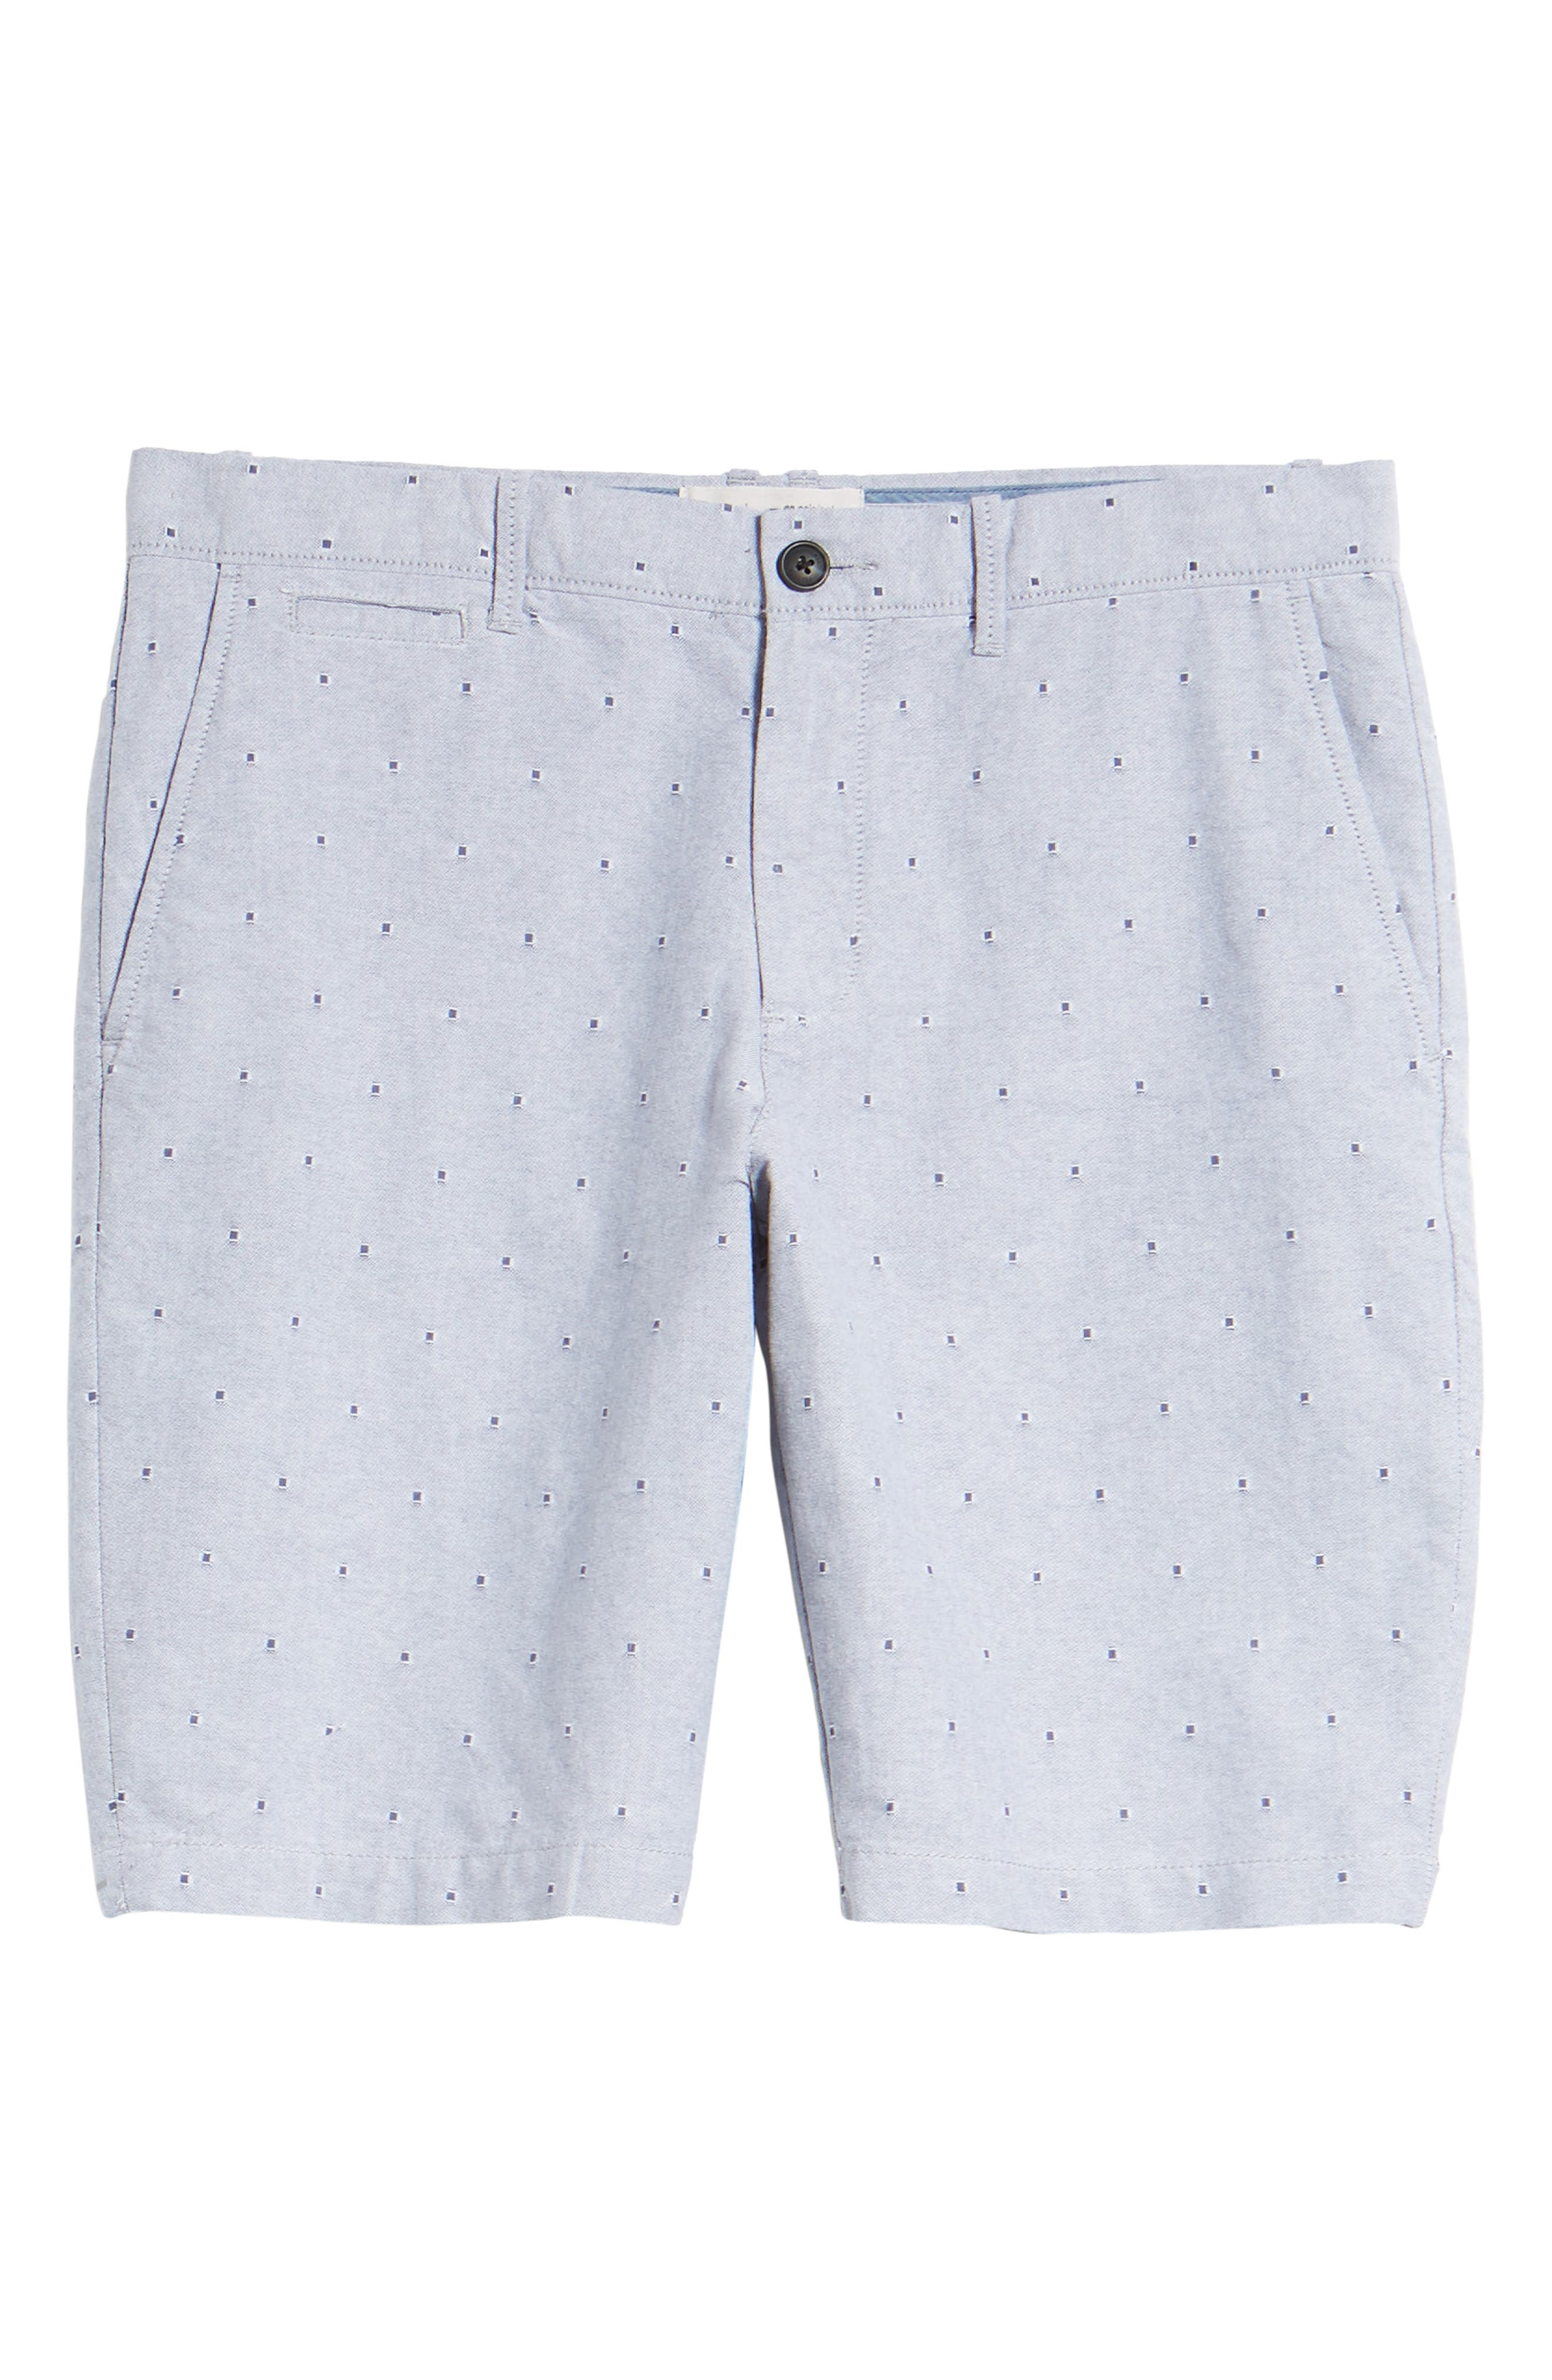 Dobby Dot Slim Fit Oxford Shorts,                             Alternate thumbnail 6, color,                             425